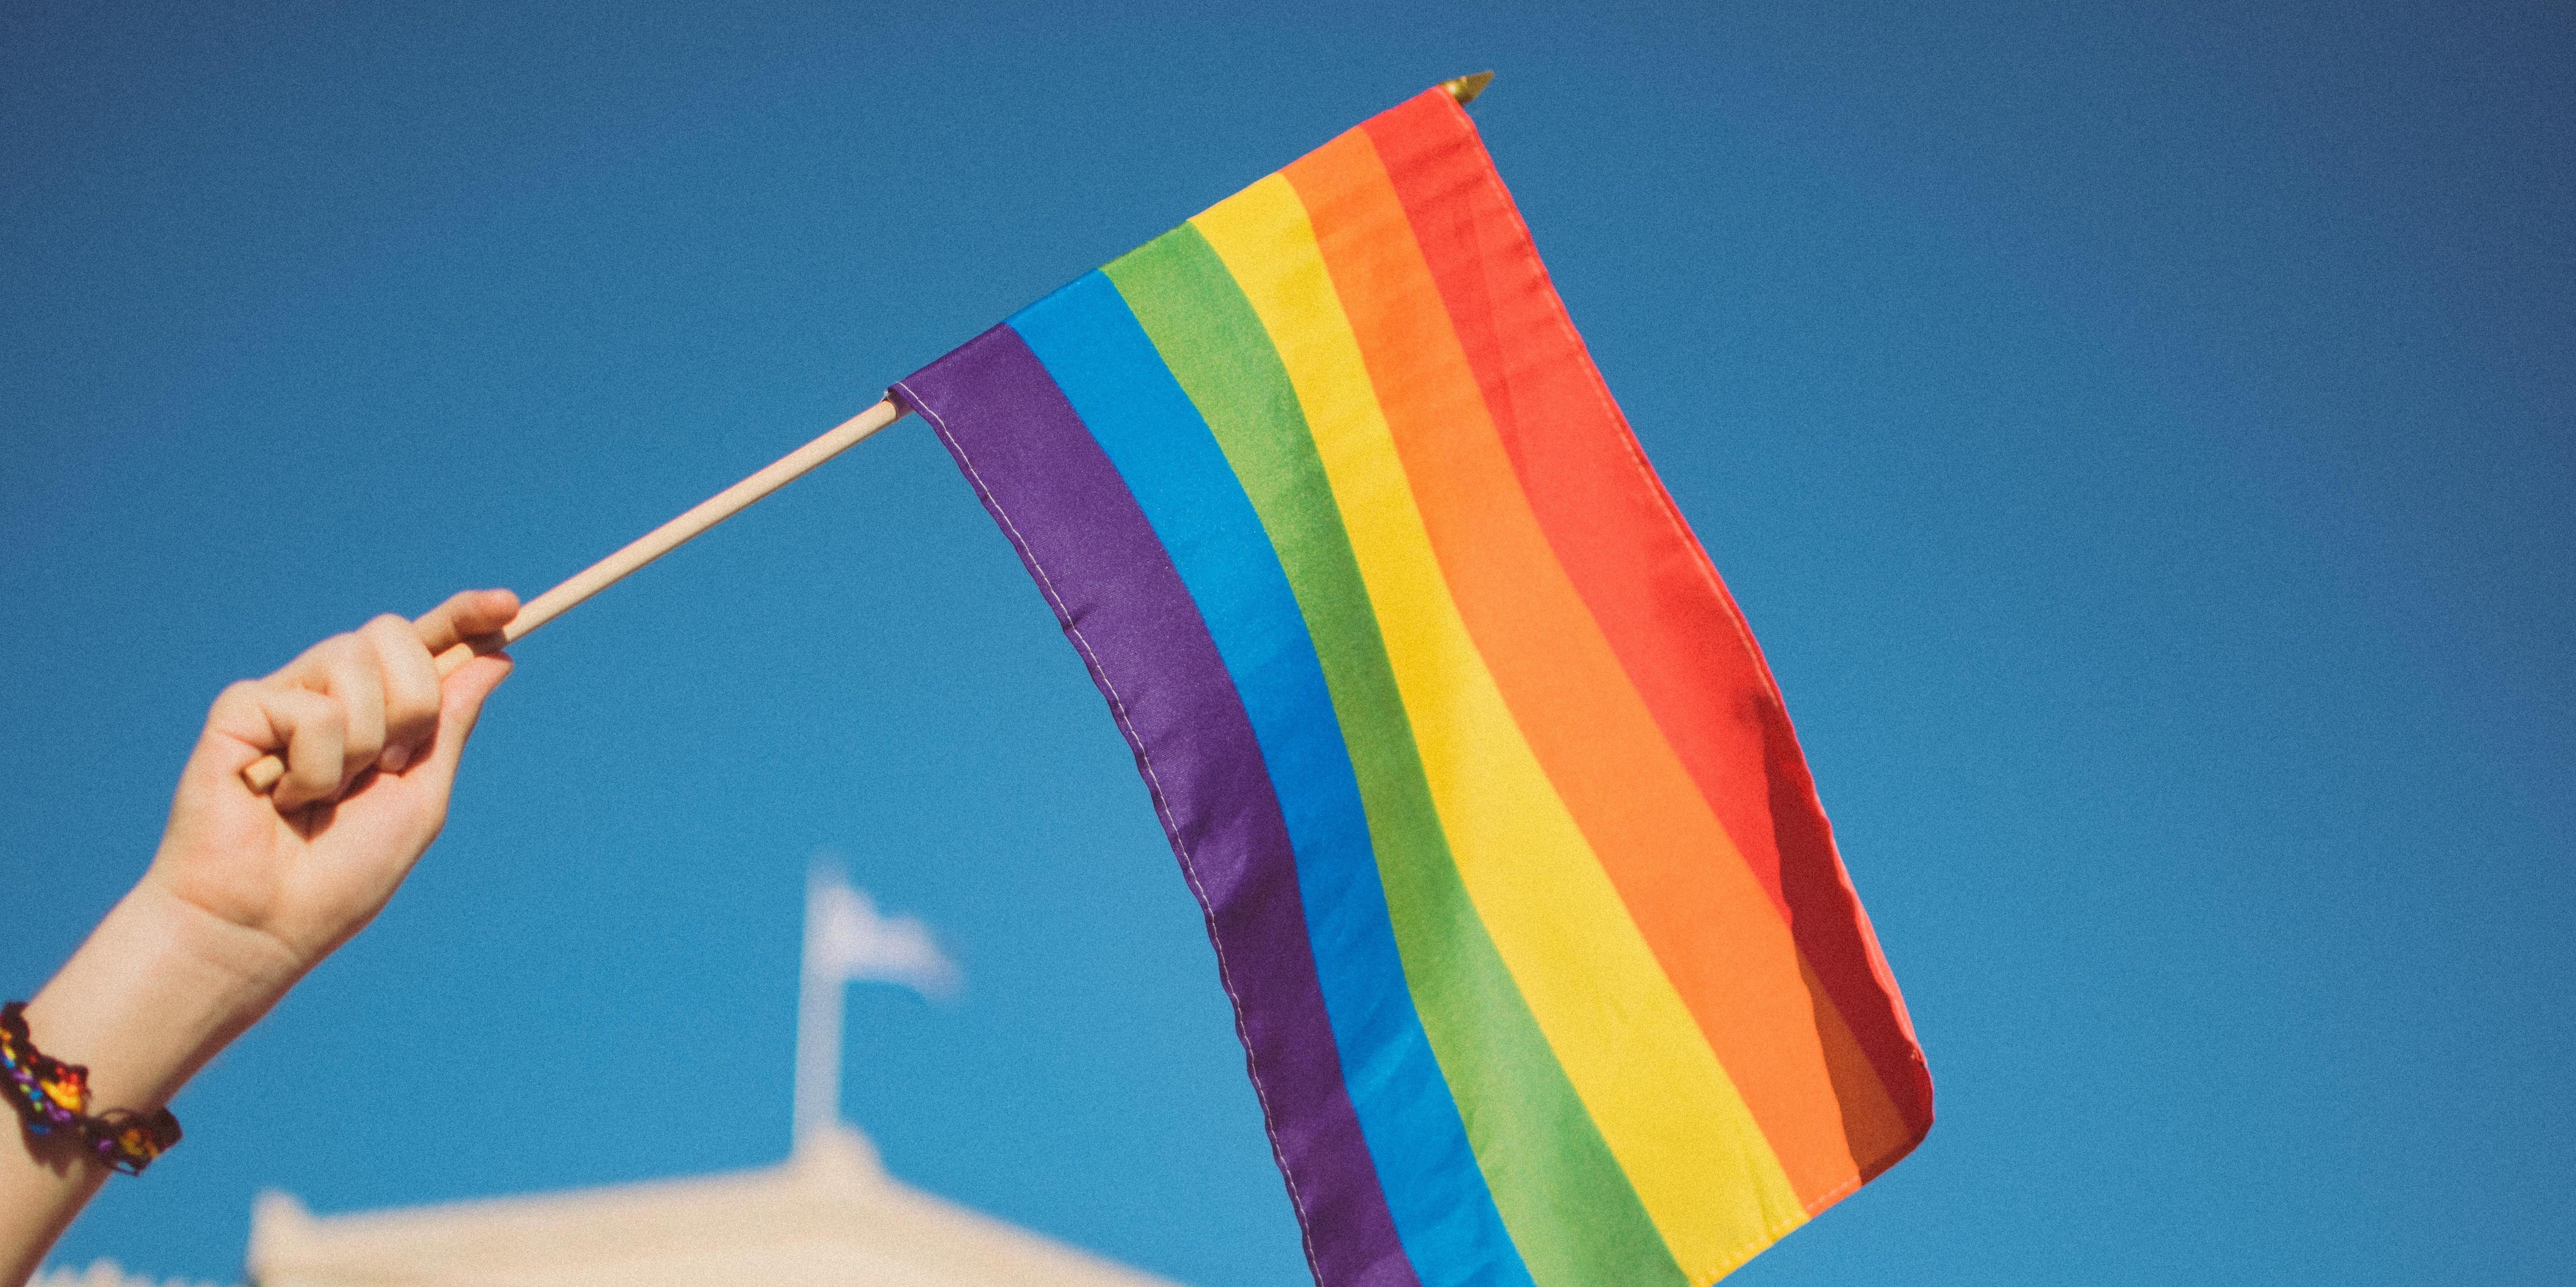 CH-Rap unterstützt die LGBTQIA+-Community